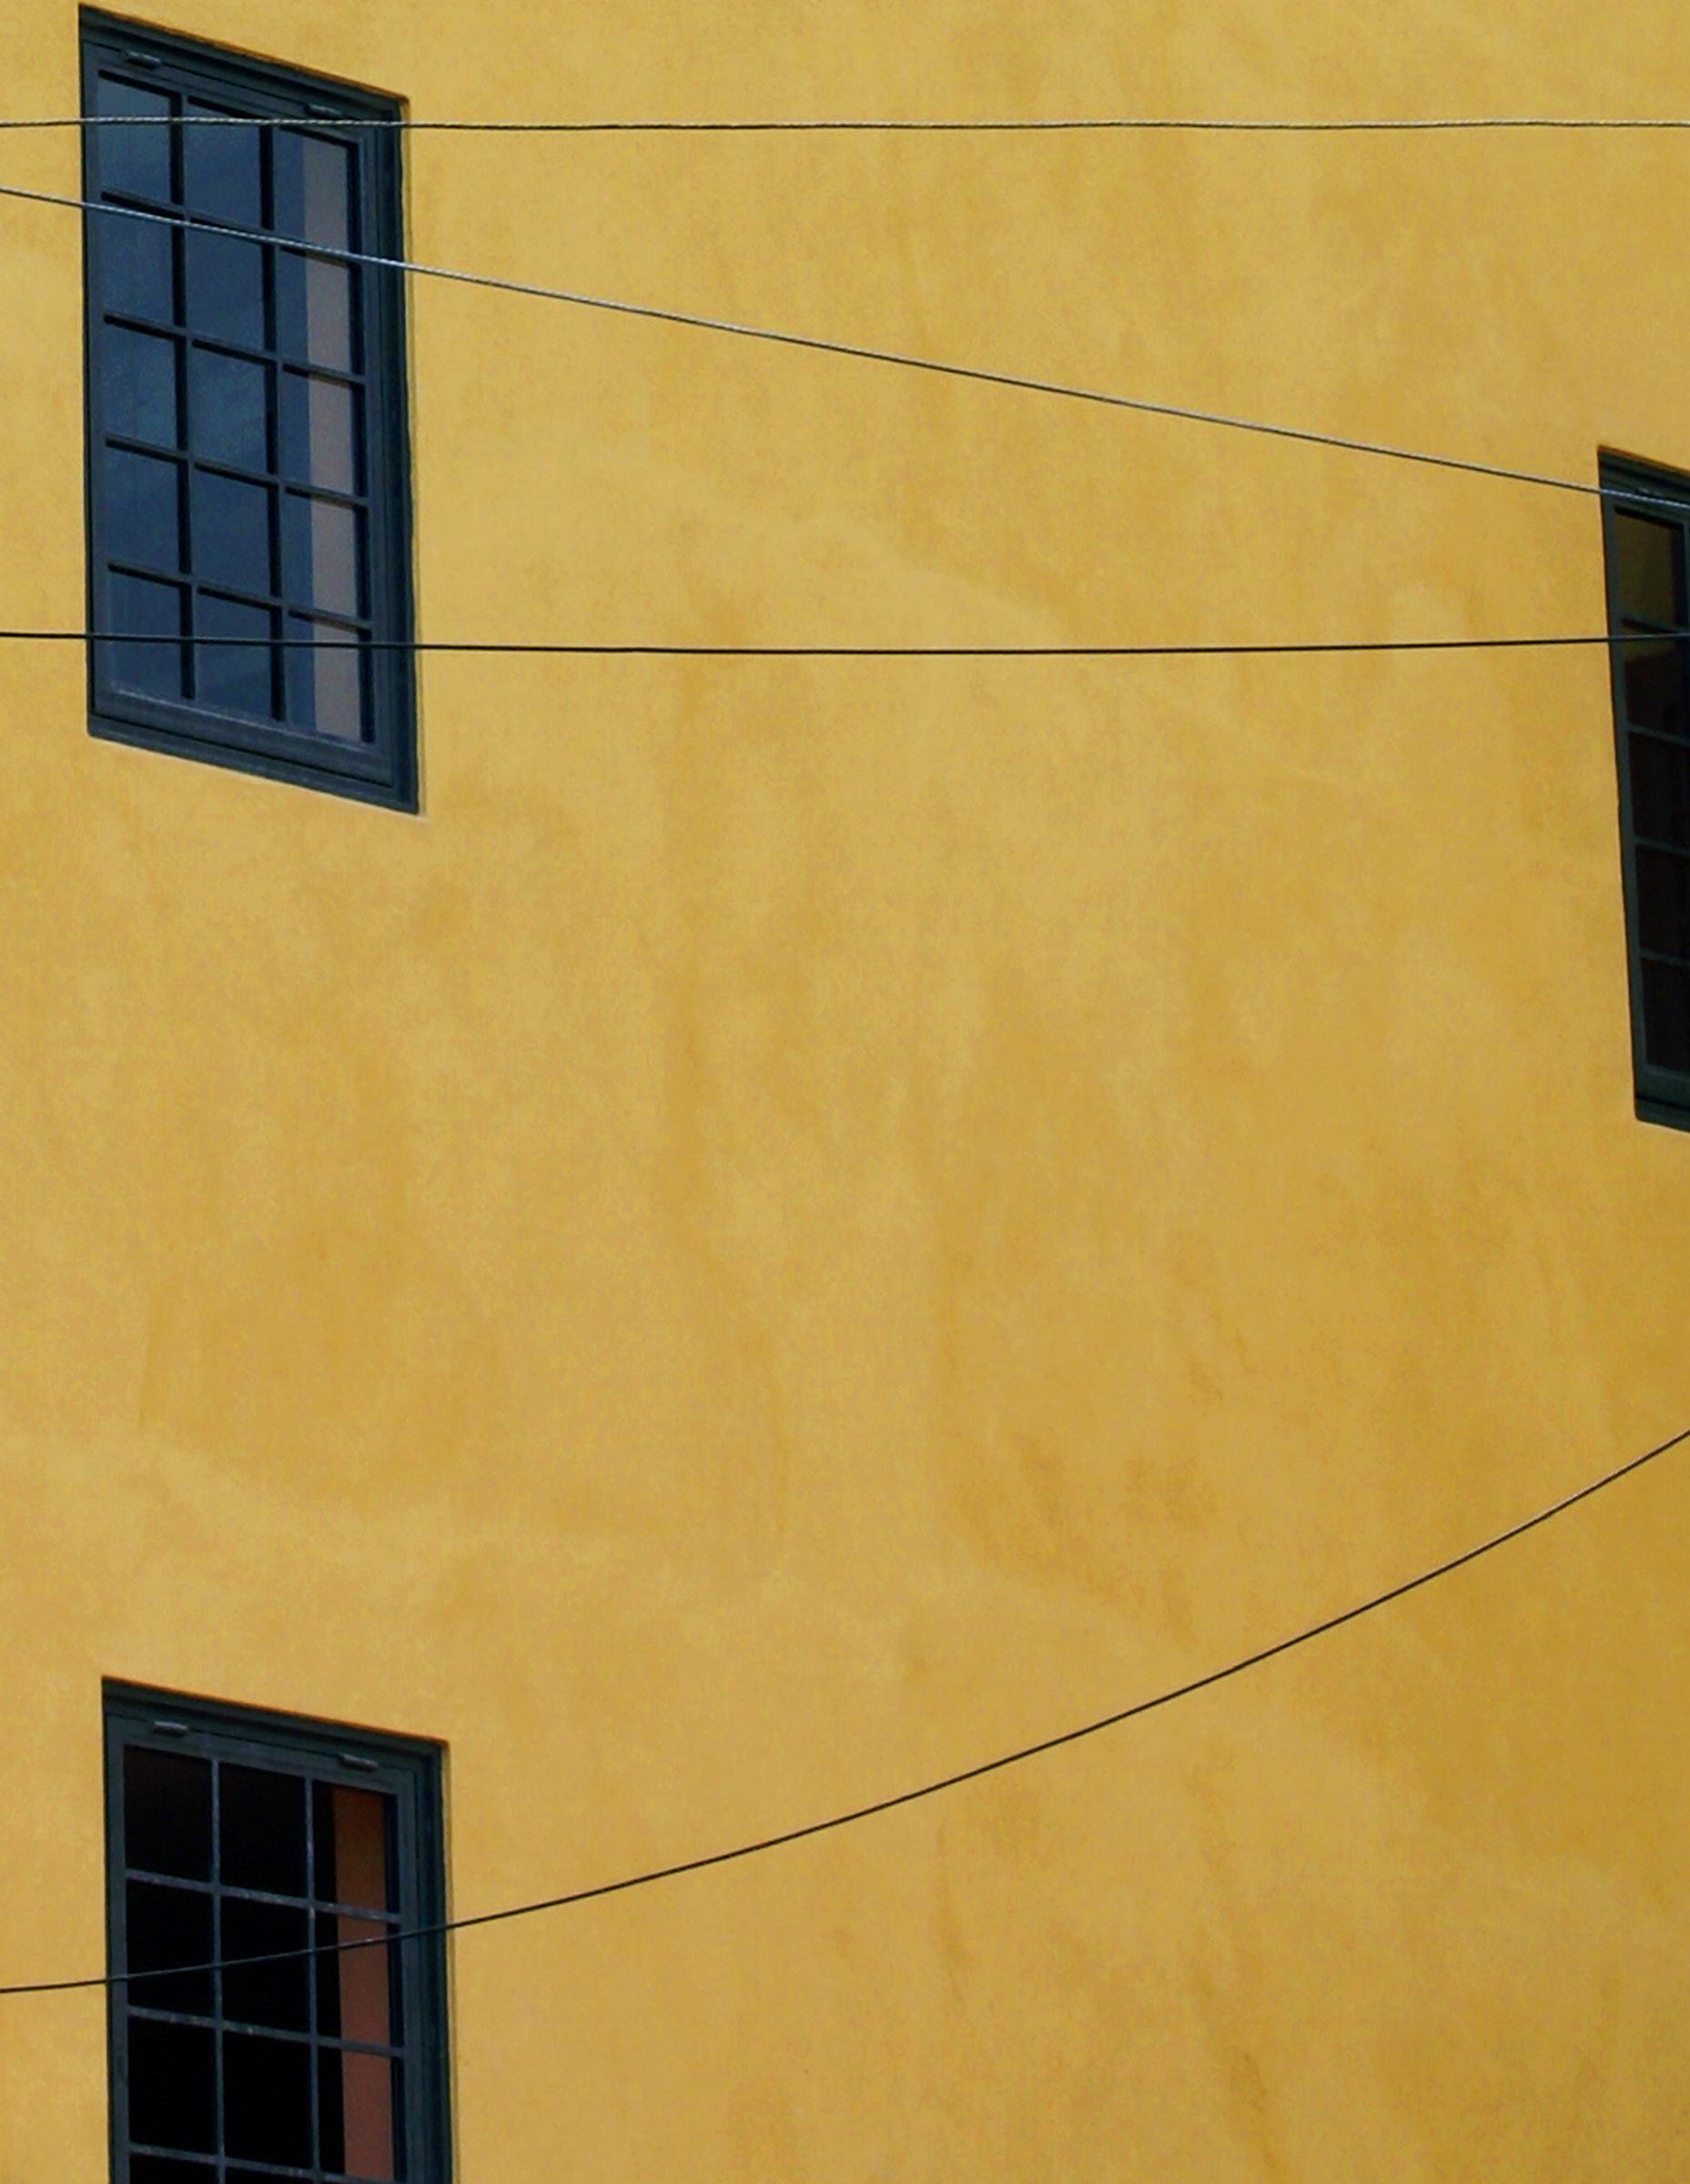 yellow wall 2.jpg